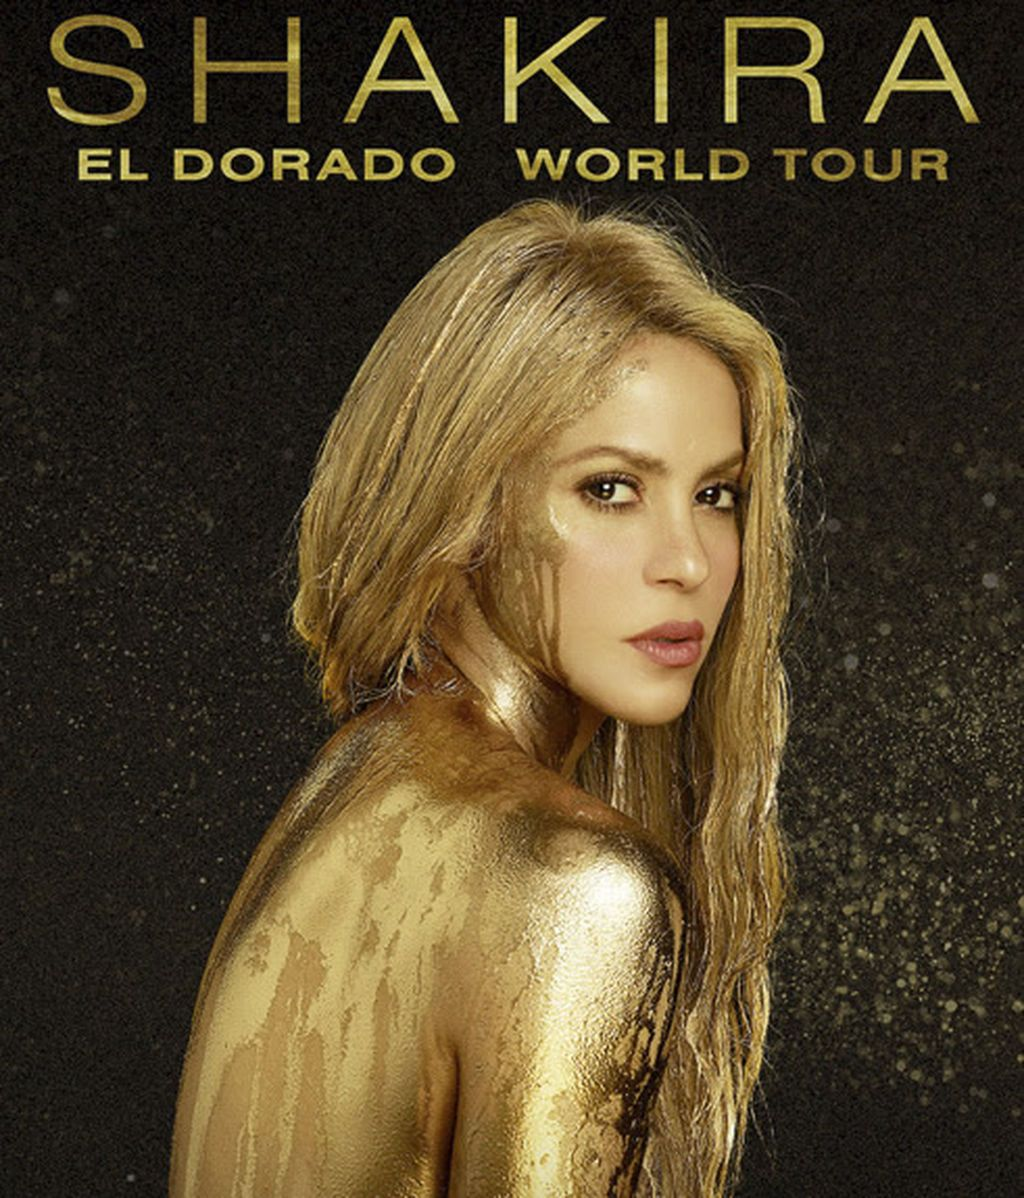 Shakira anuncia la gira mundial de 'El Dorado'